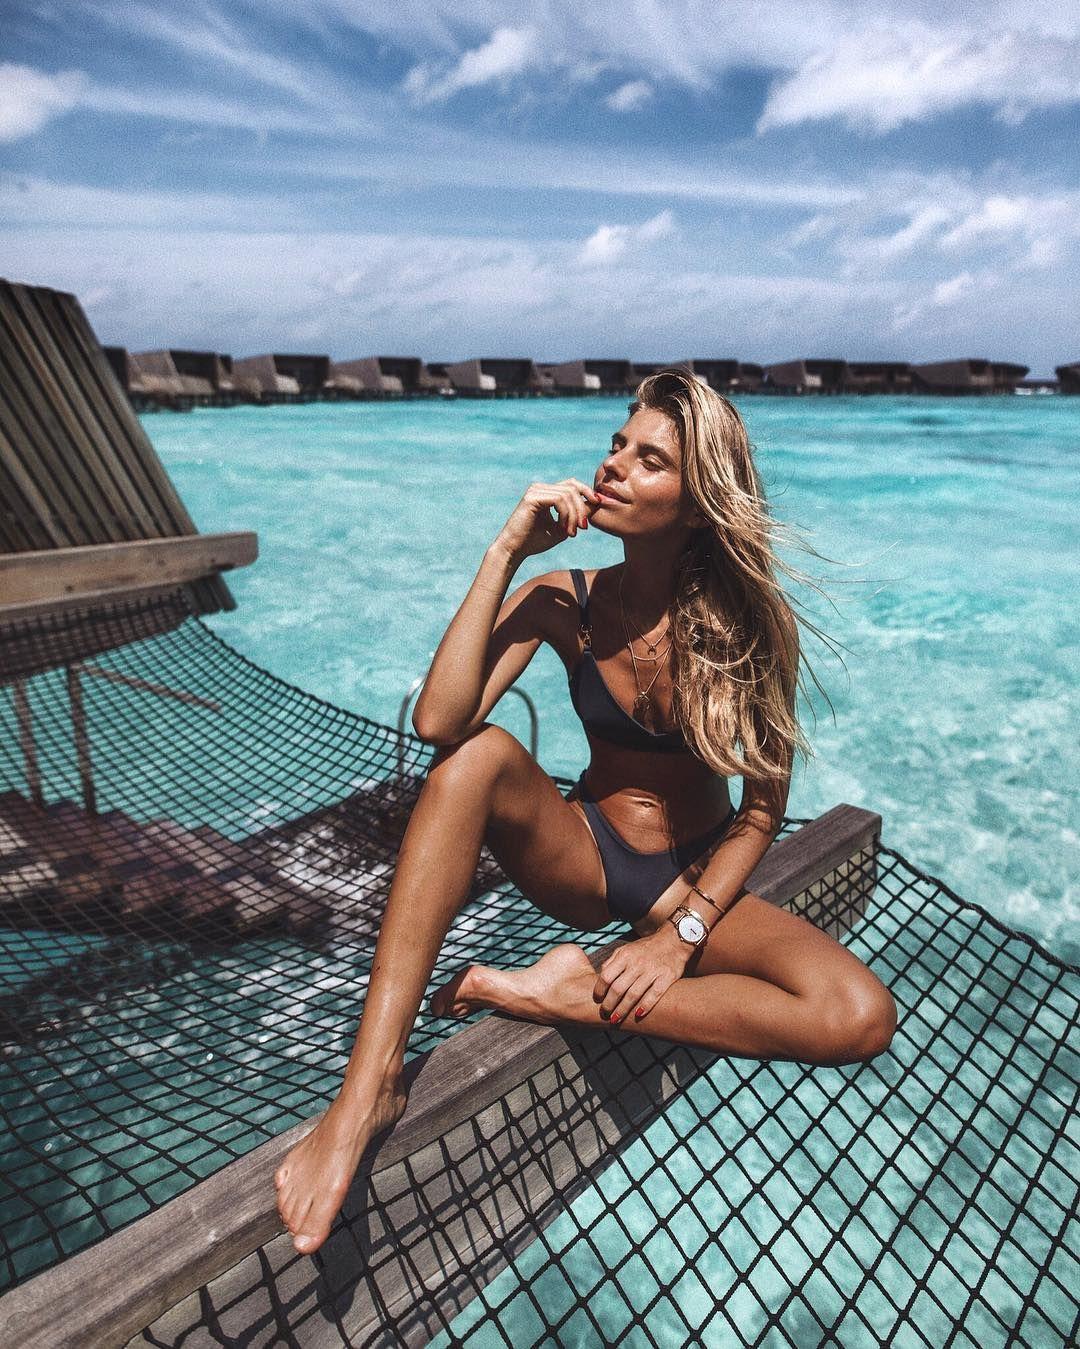 Celebrites Debi Flugge nude photos 2019